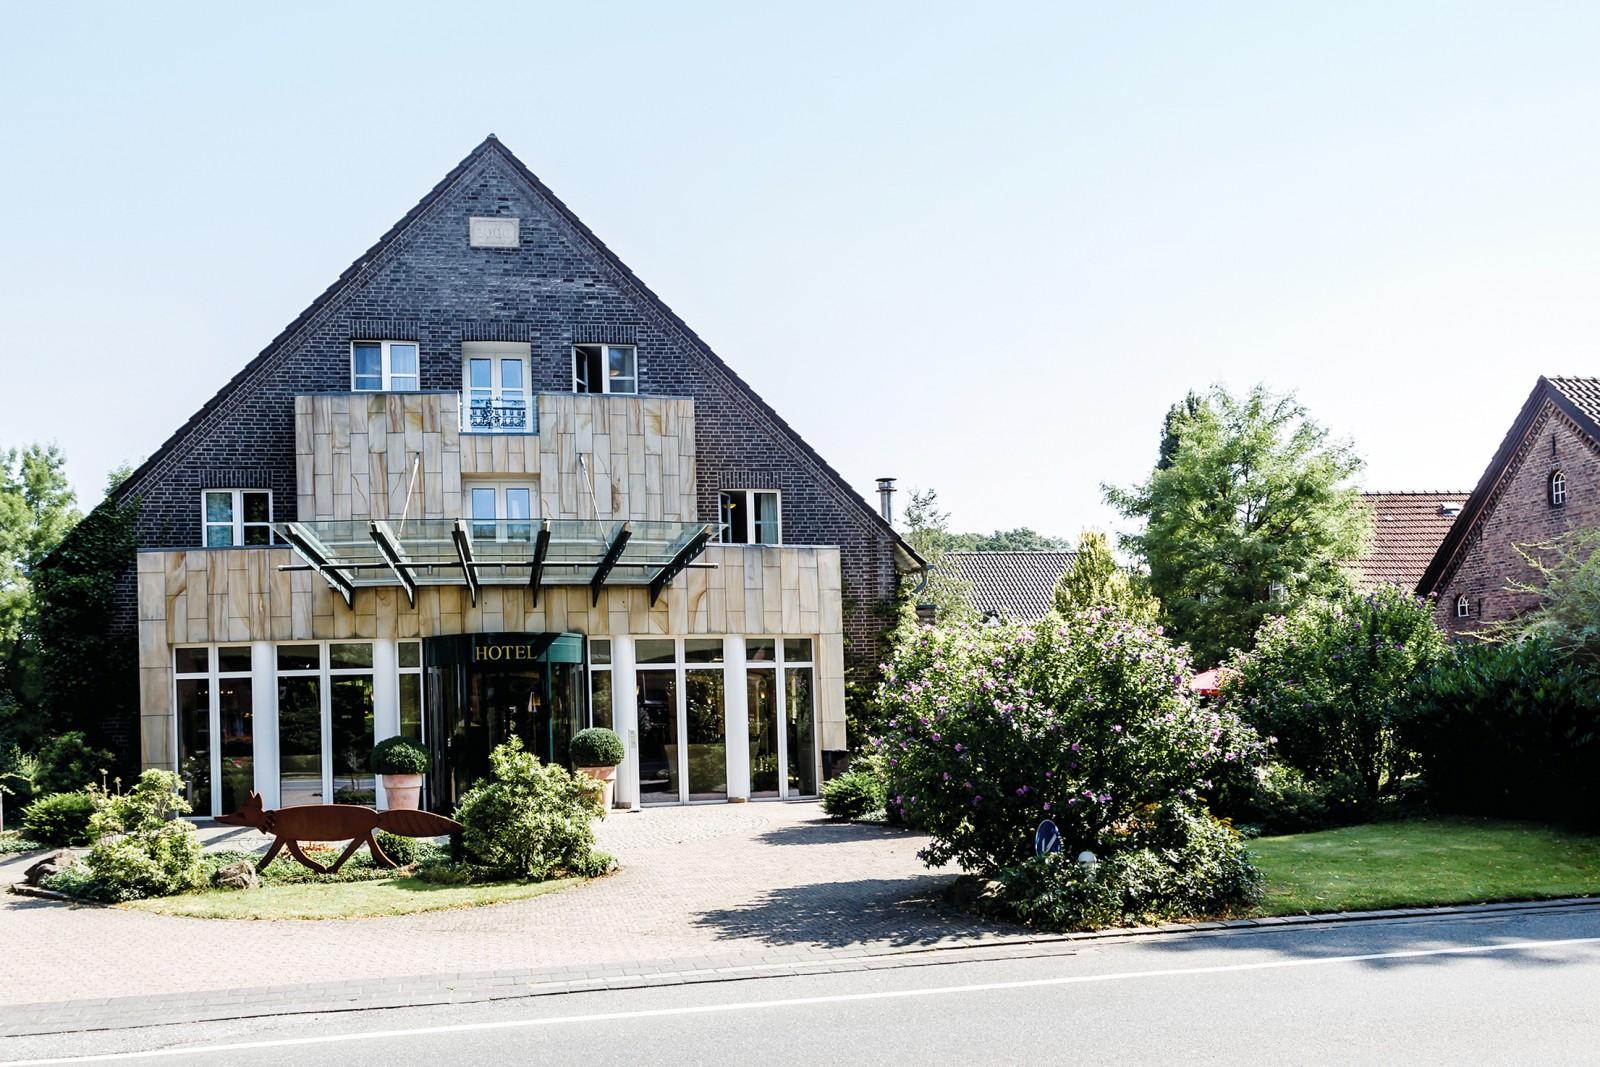 restaurant landhotel vosh vel in schermbeck. Black Bedroom Furniture Sets. Home Design Ideas